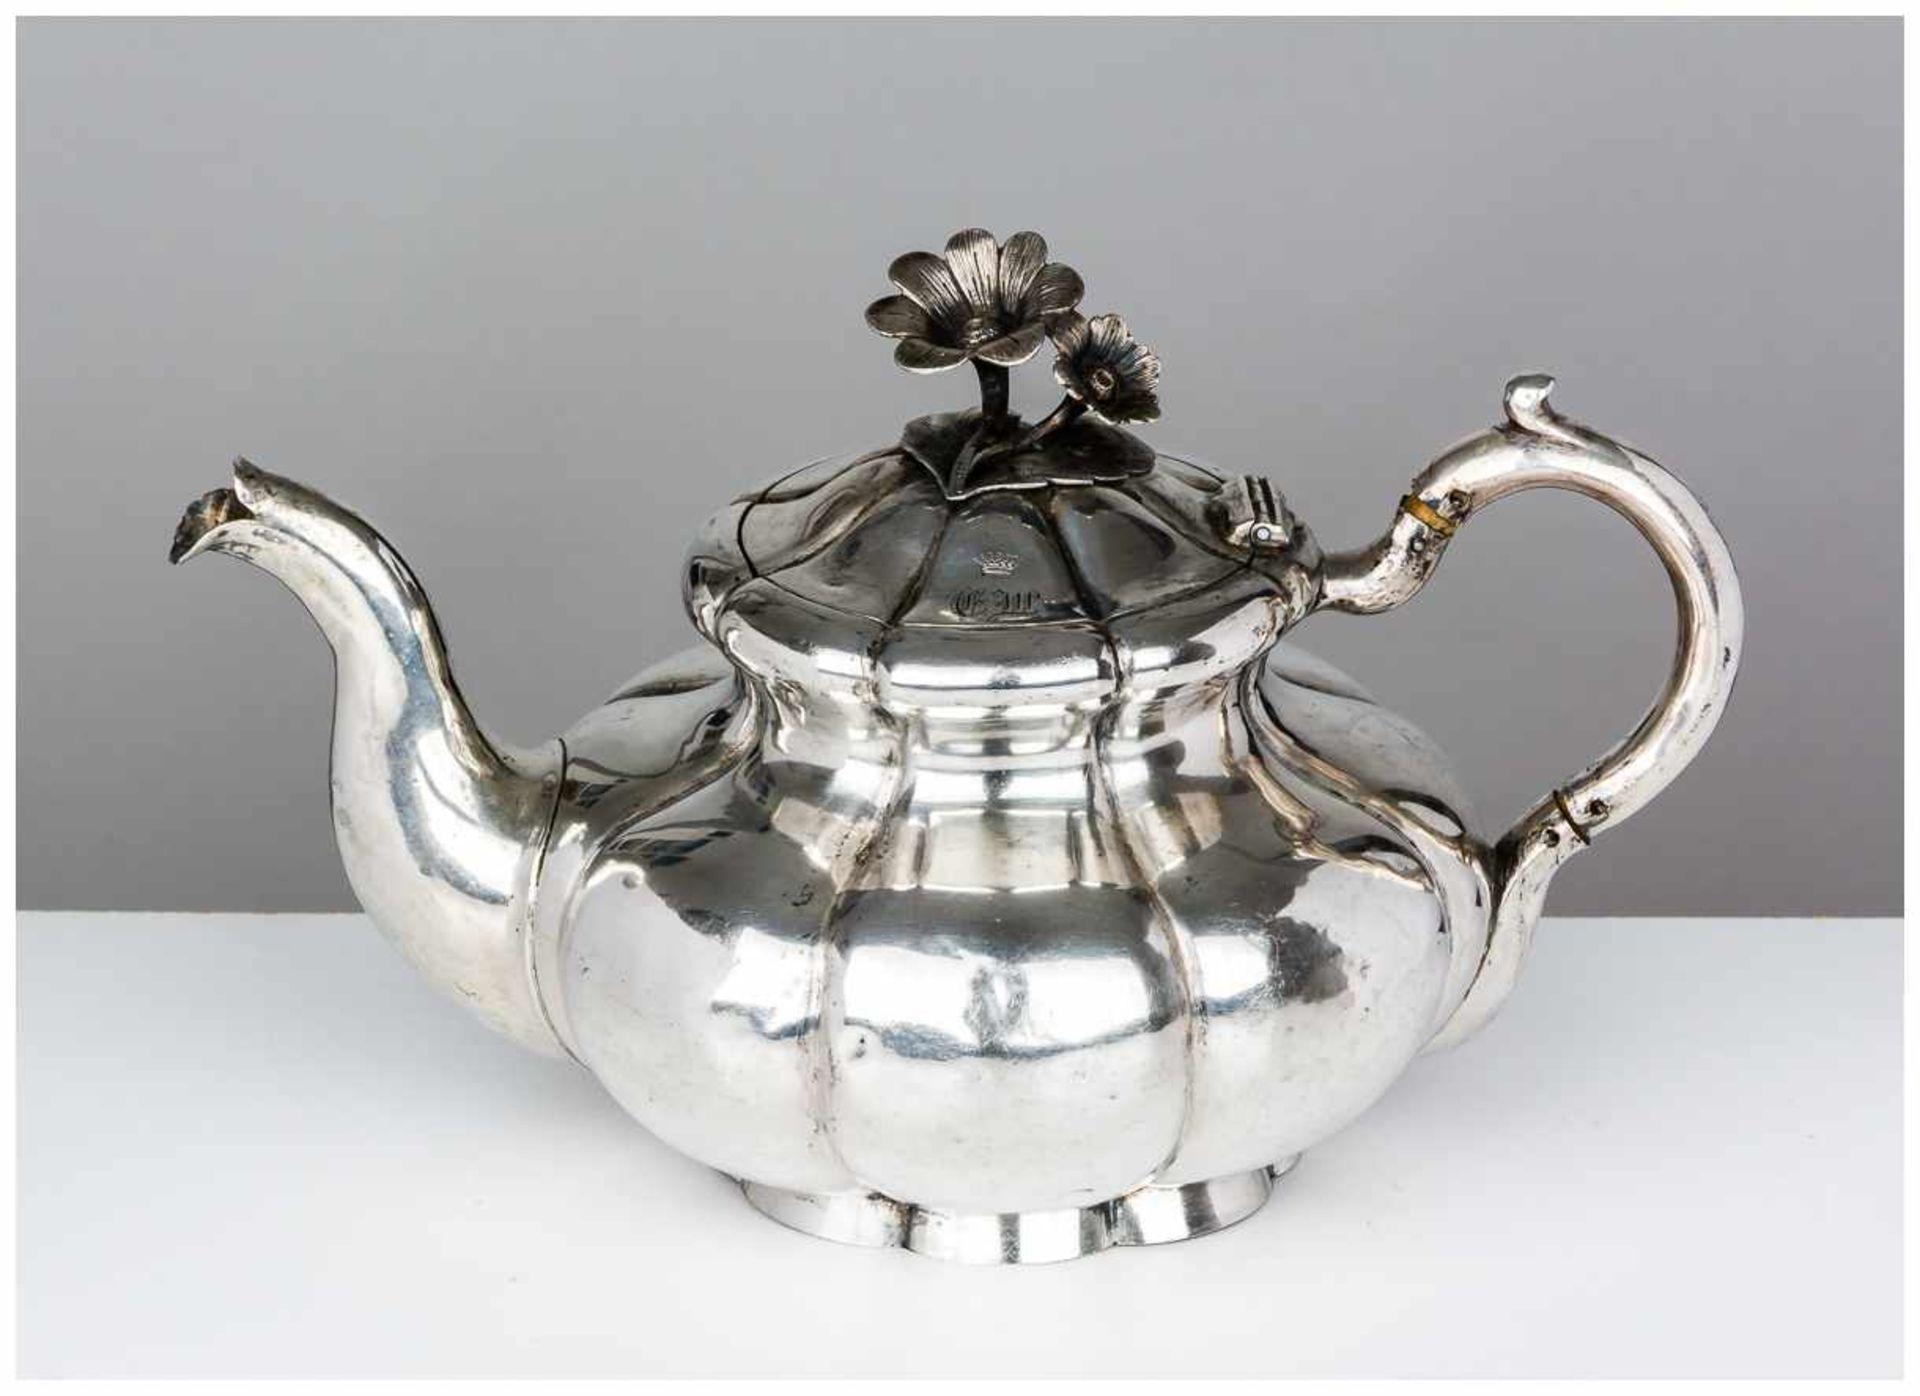 Los 21 - Teekanne St. Petersburg, 1862 Silber, innen vergoldet, 384g Beschaumeister: Eduard Brandenburg